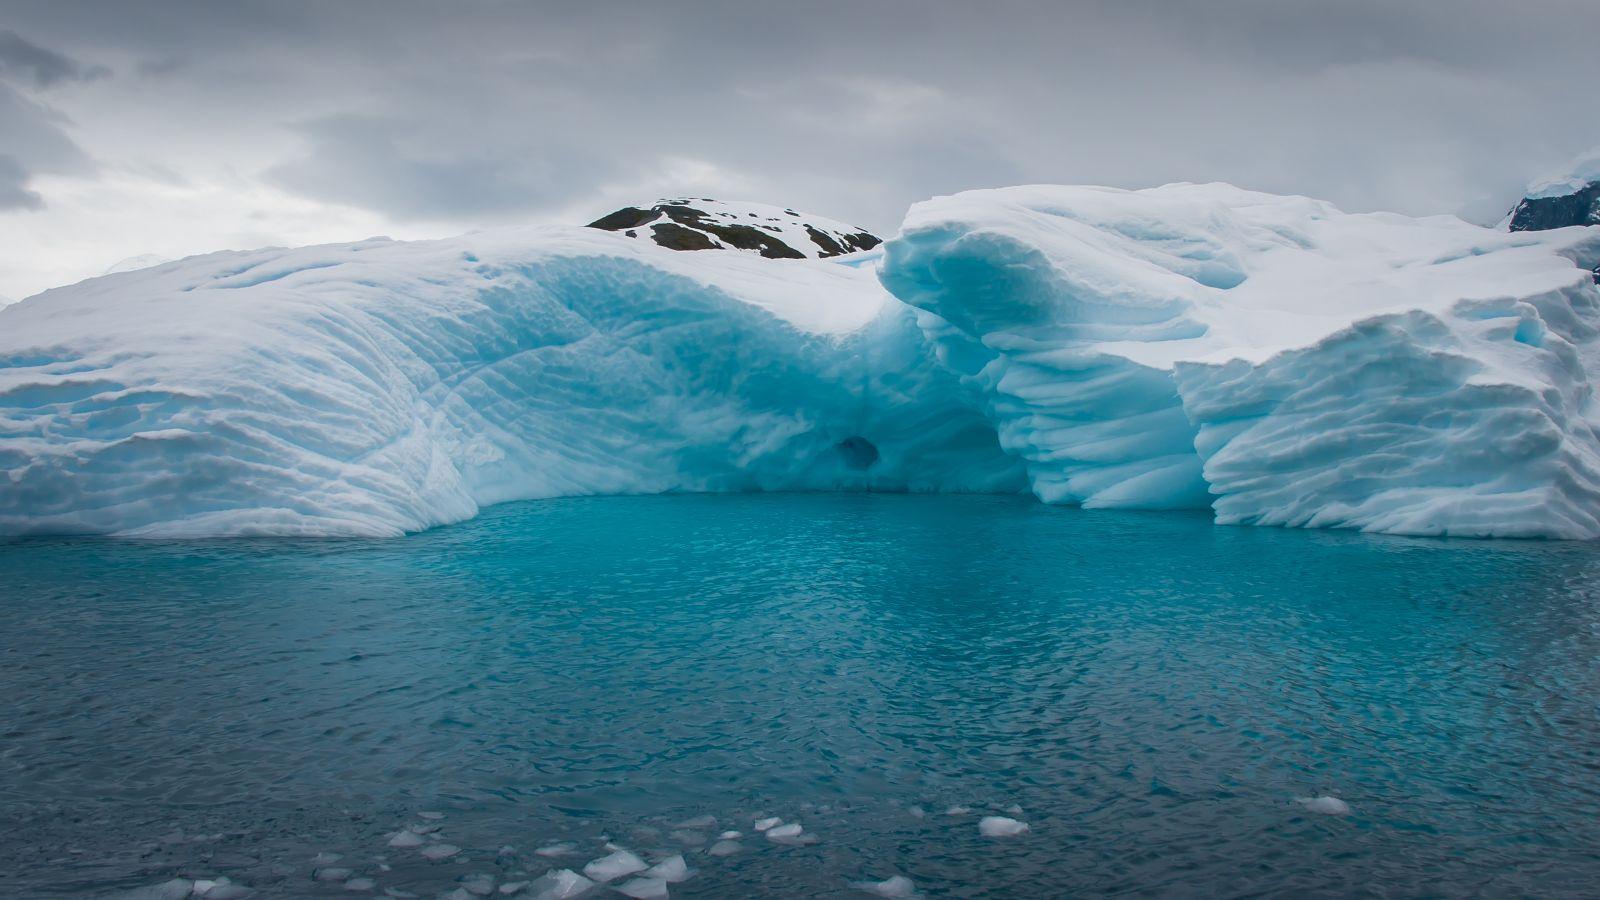 Landscape of an iceberg in a deep blue antarctic sea